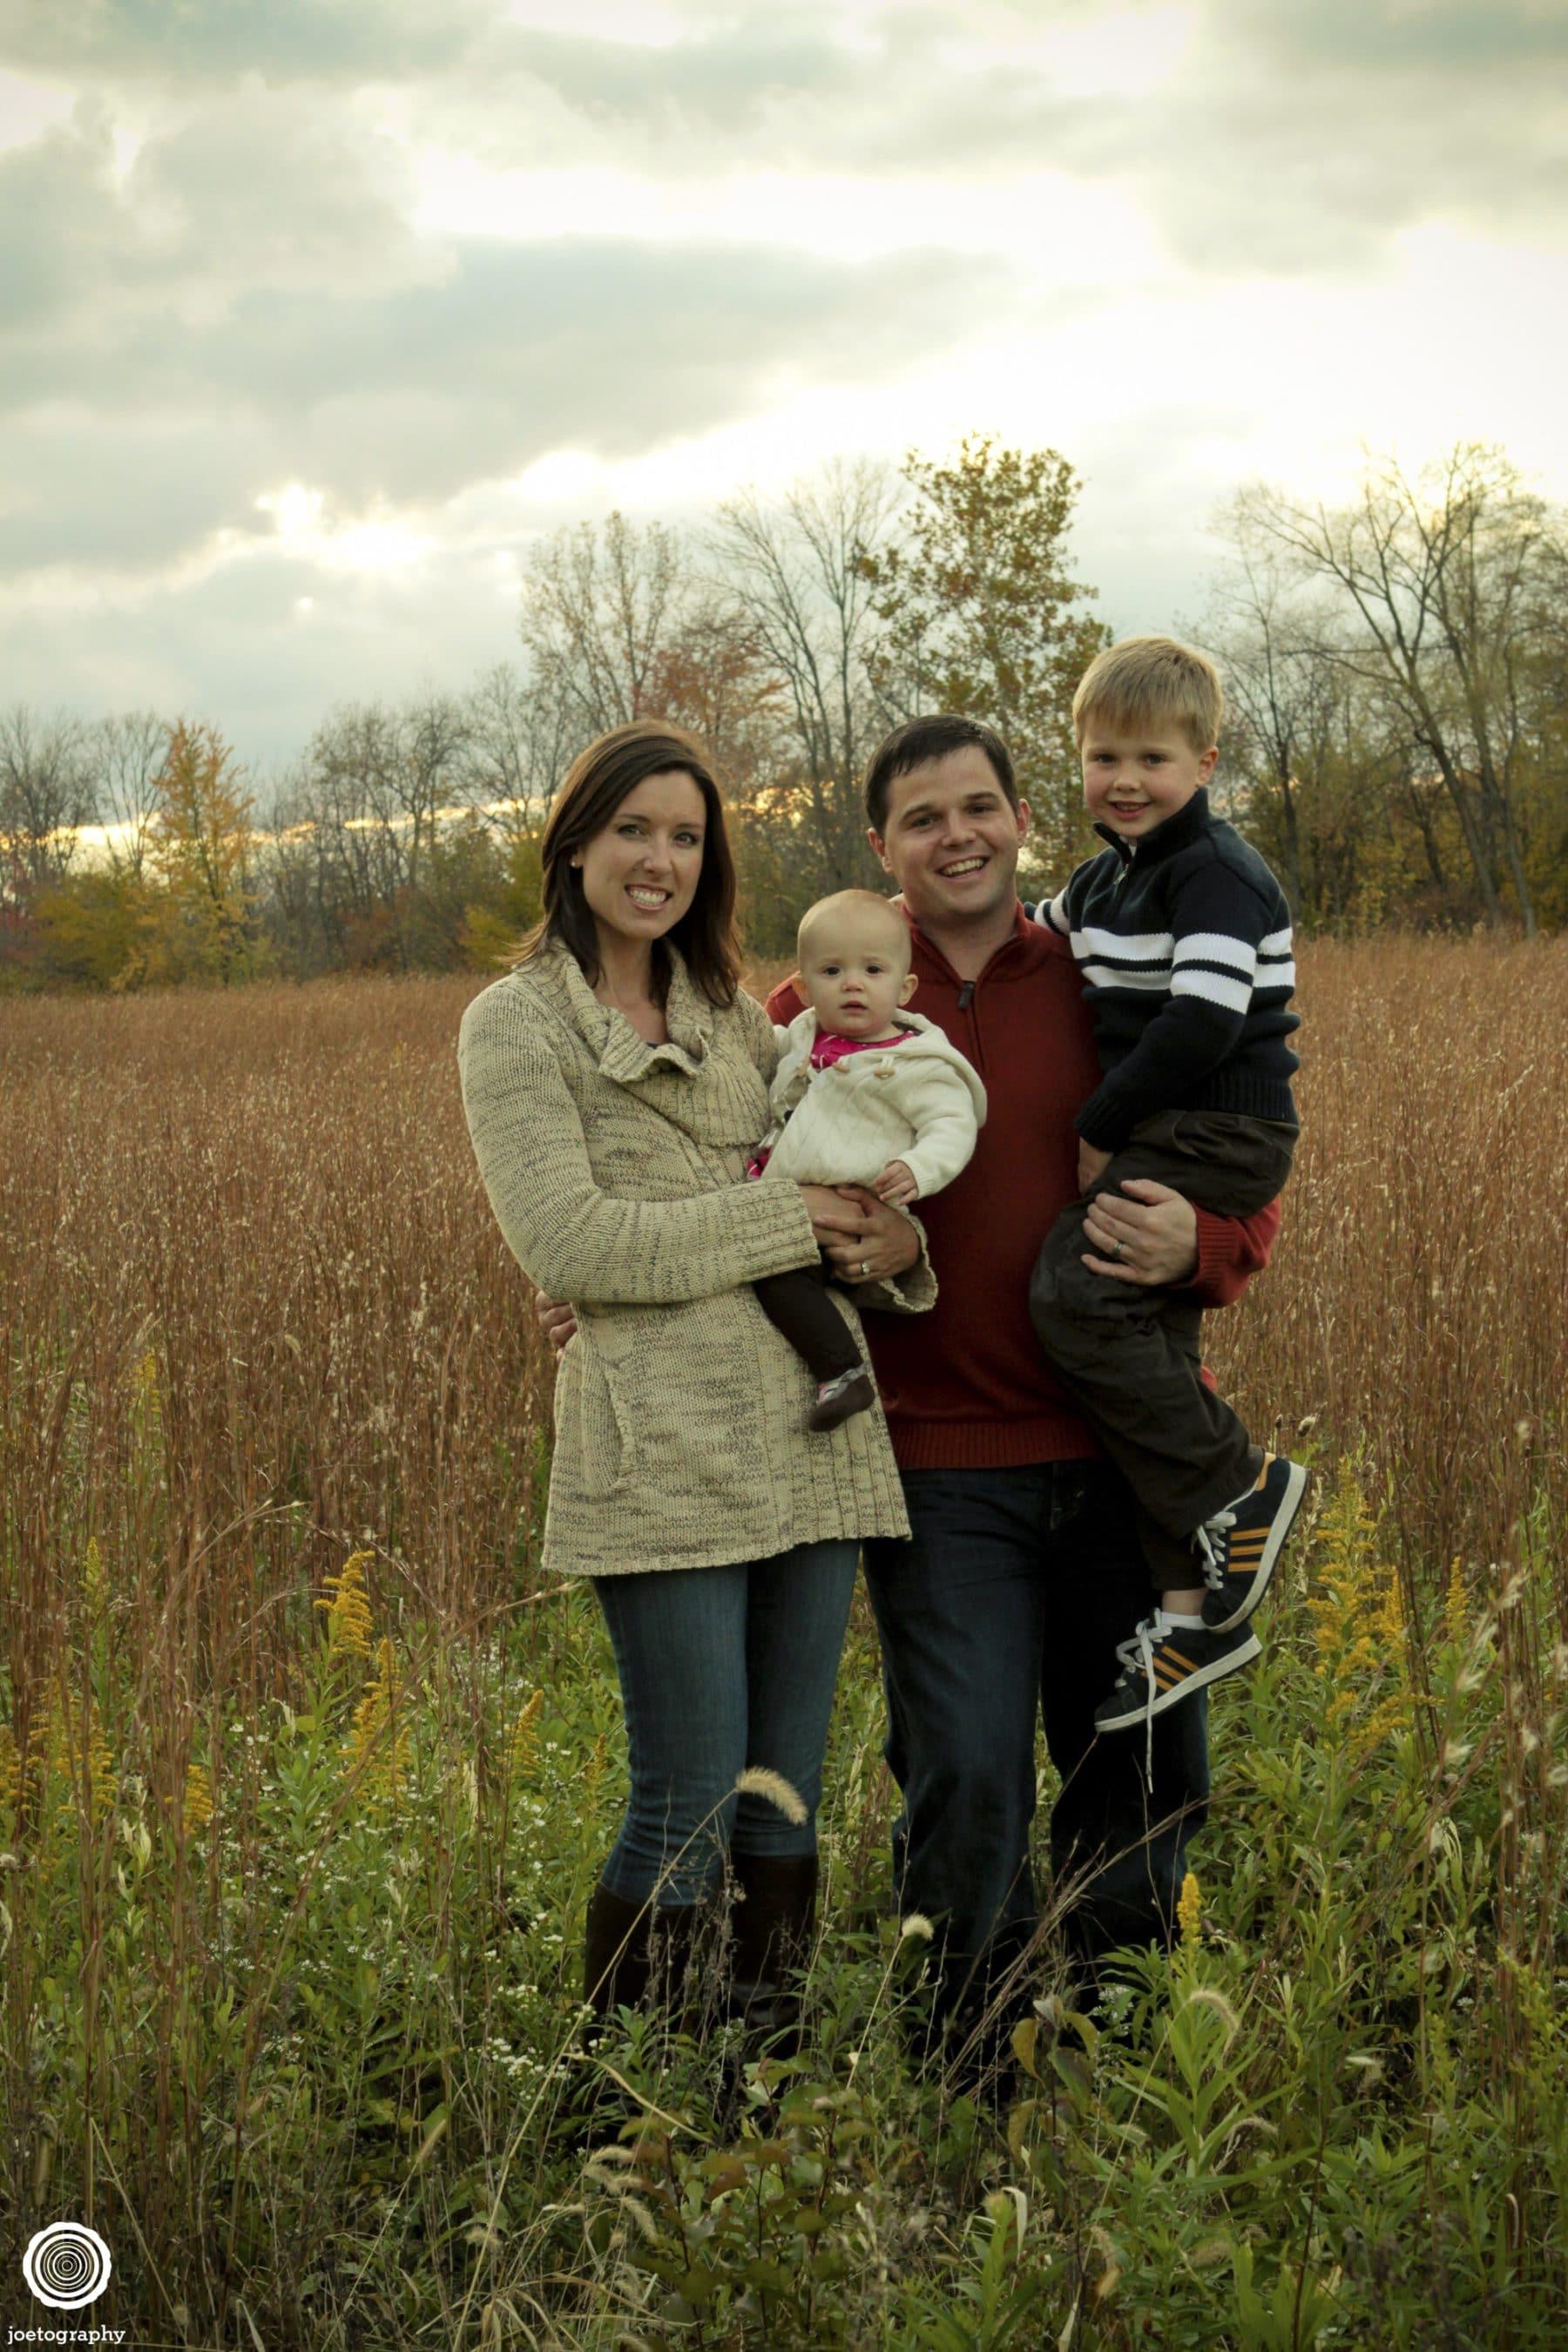 Albert-Family-Photographs-Fishers-Indiana-68